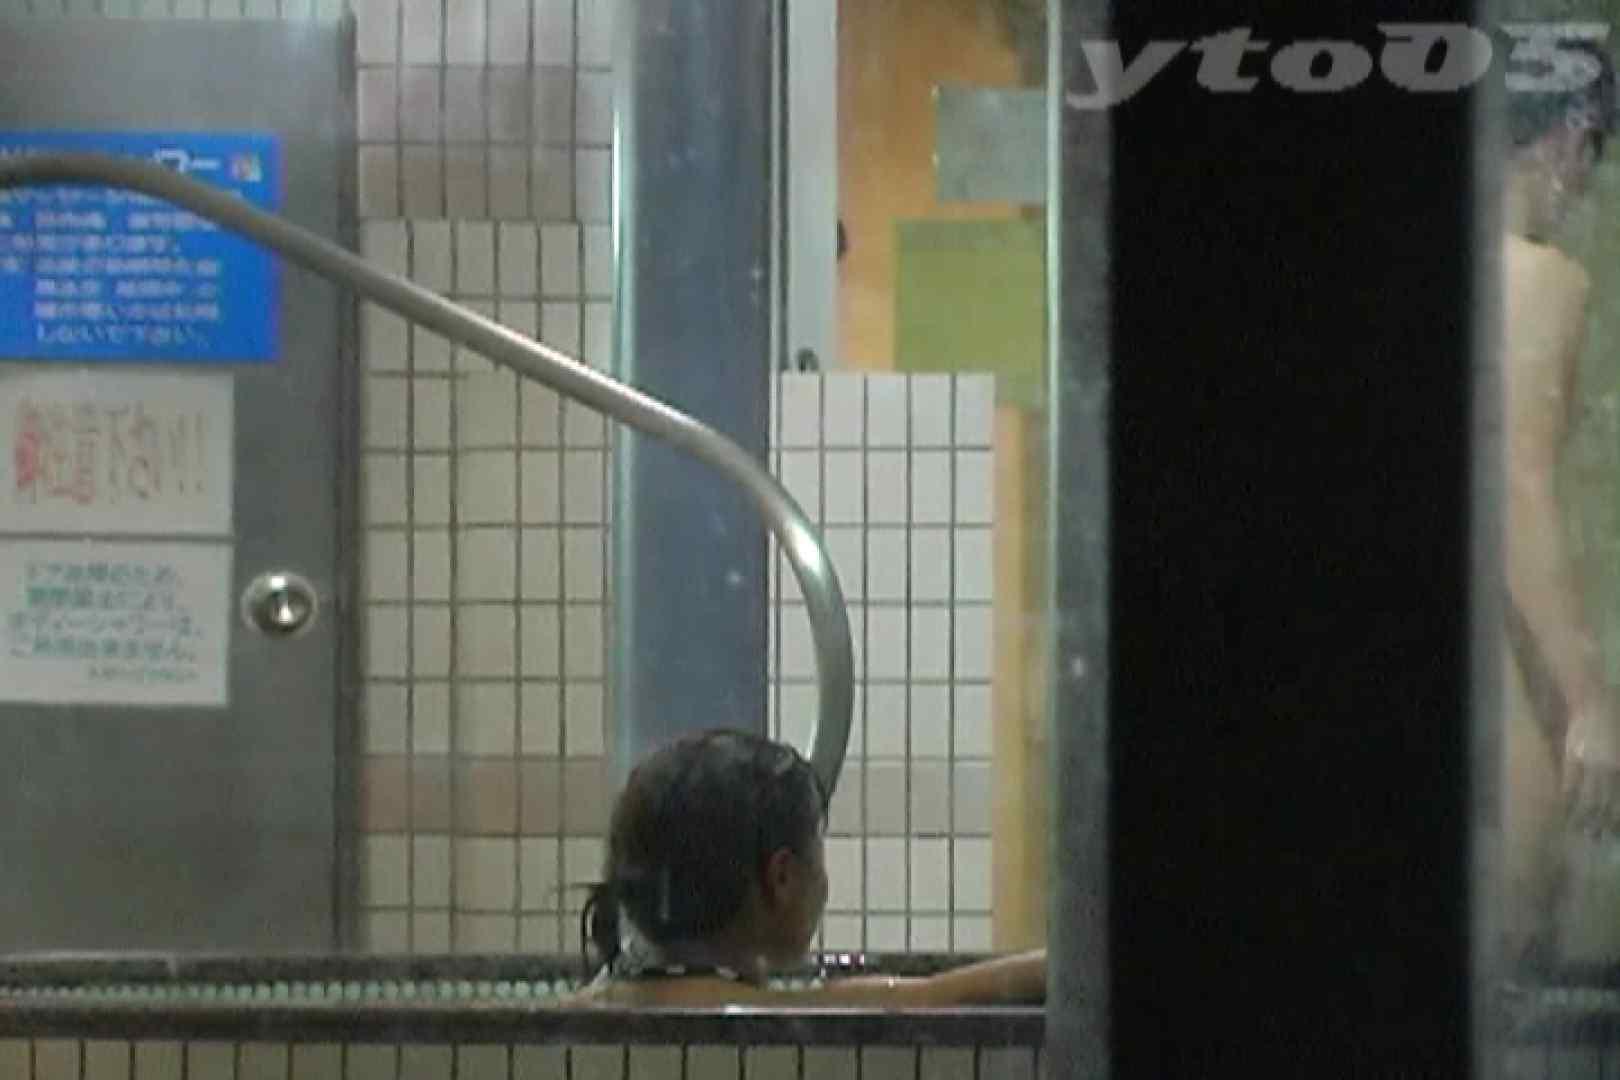 ▲復活限定▲合宿ホテル女風呂盗撮 Vol.31 合宿 エロ画像 84連発 47